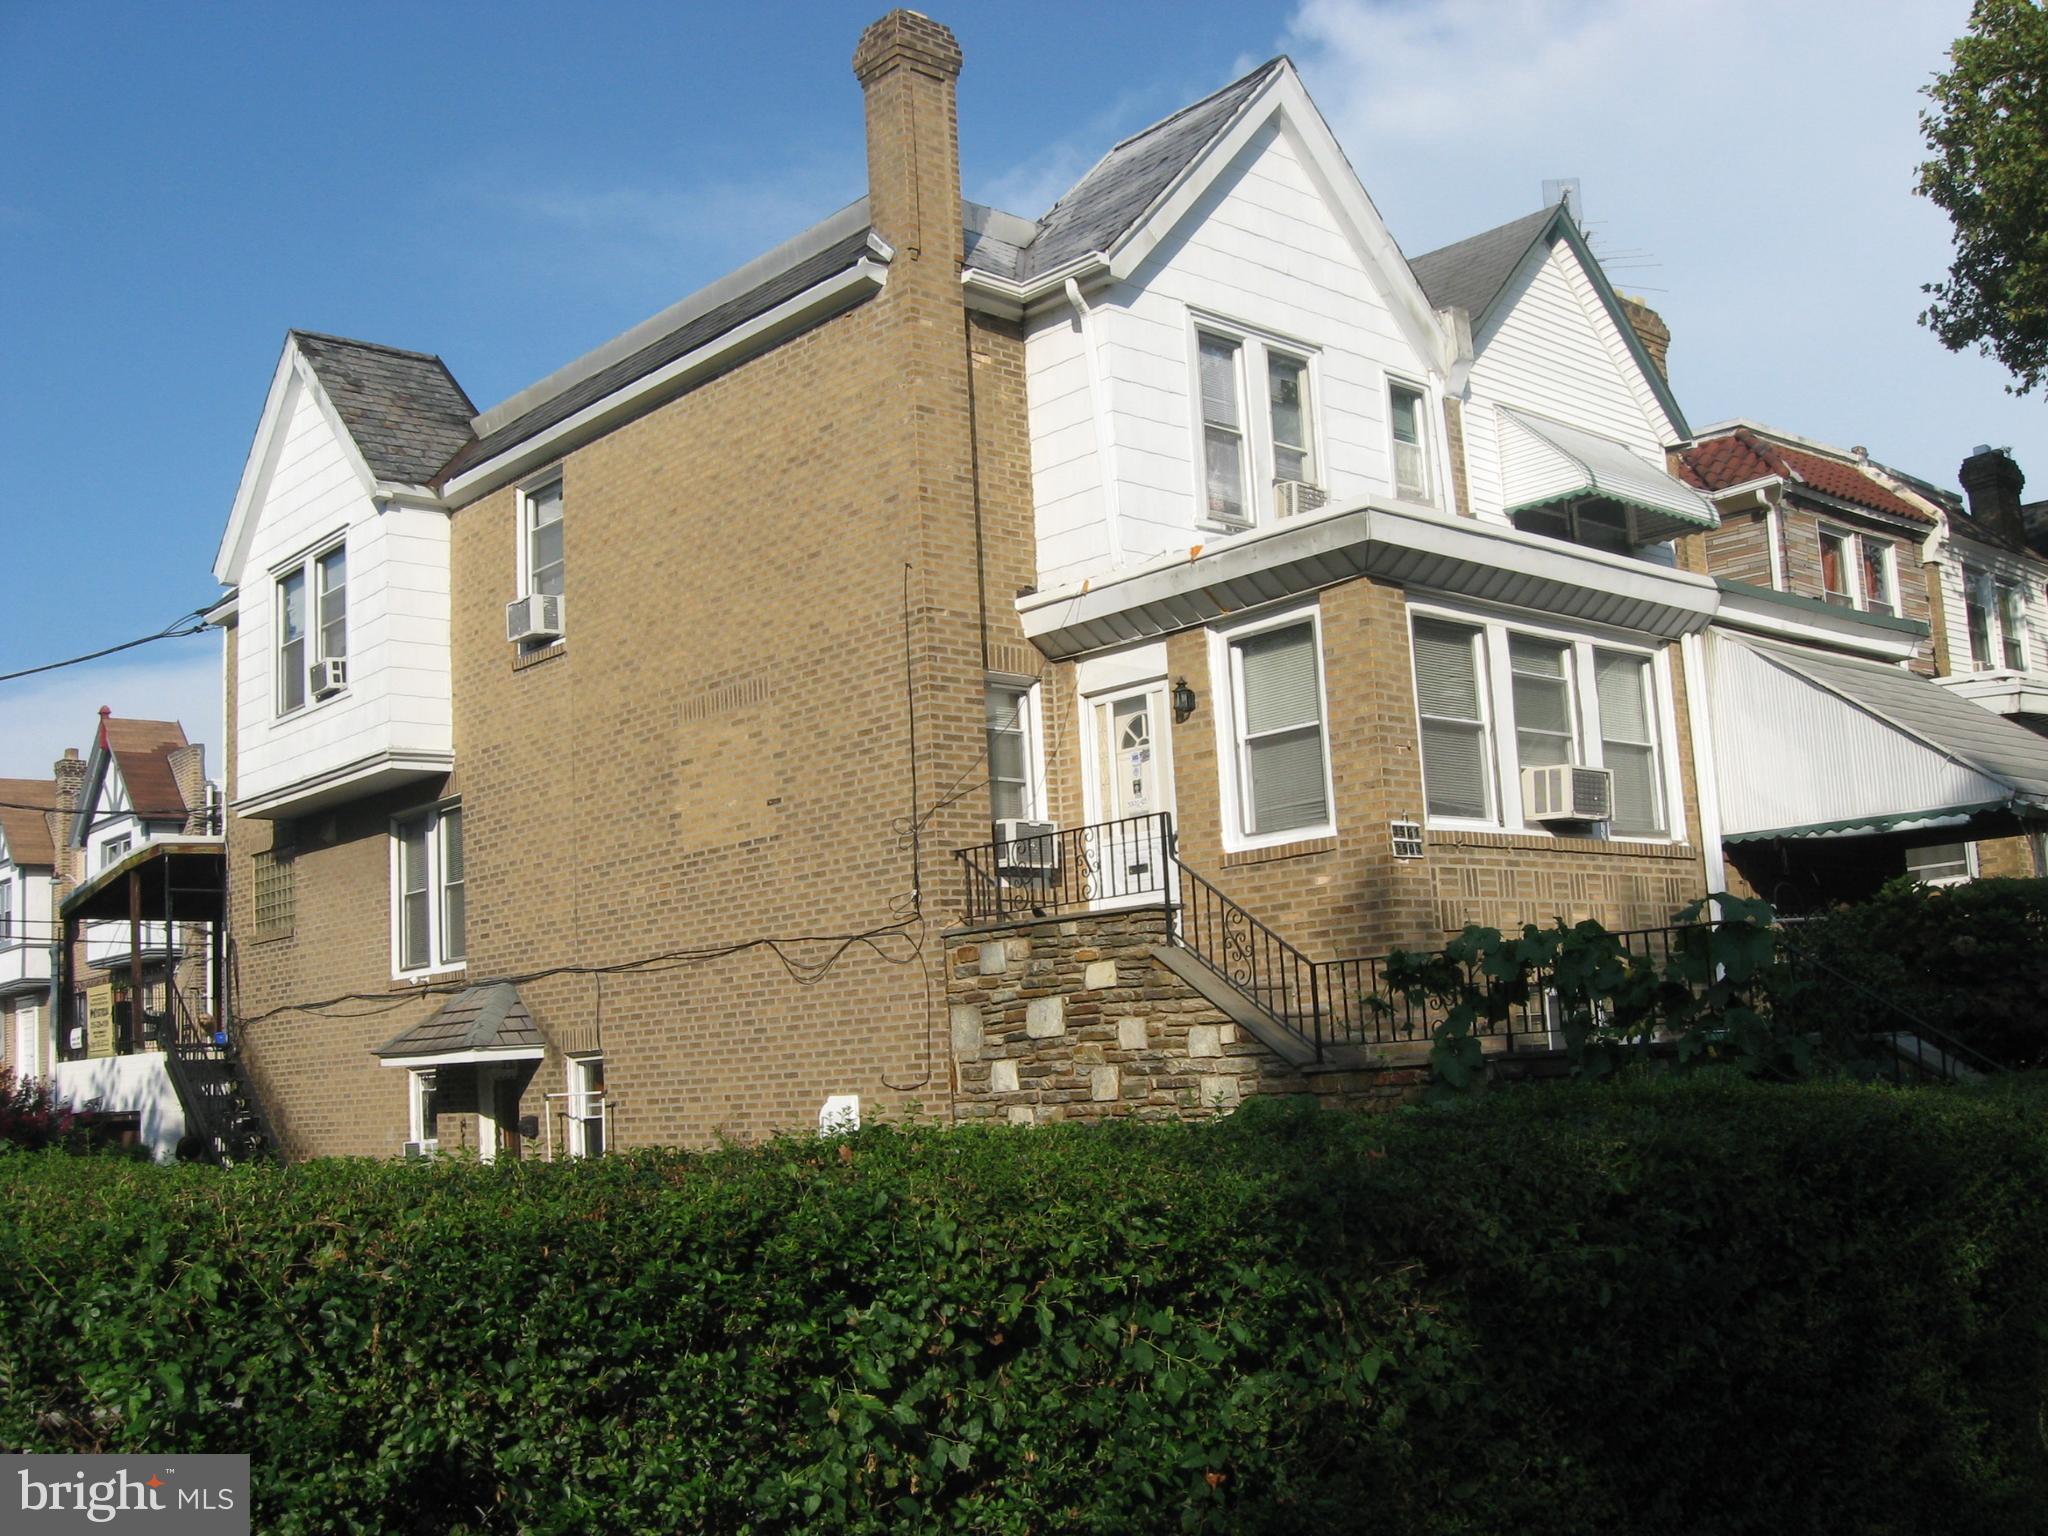 3501 ENGLEWOOD STREET, PHILADELPHIA, PA 19149